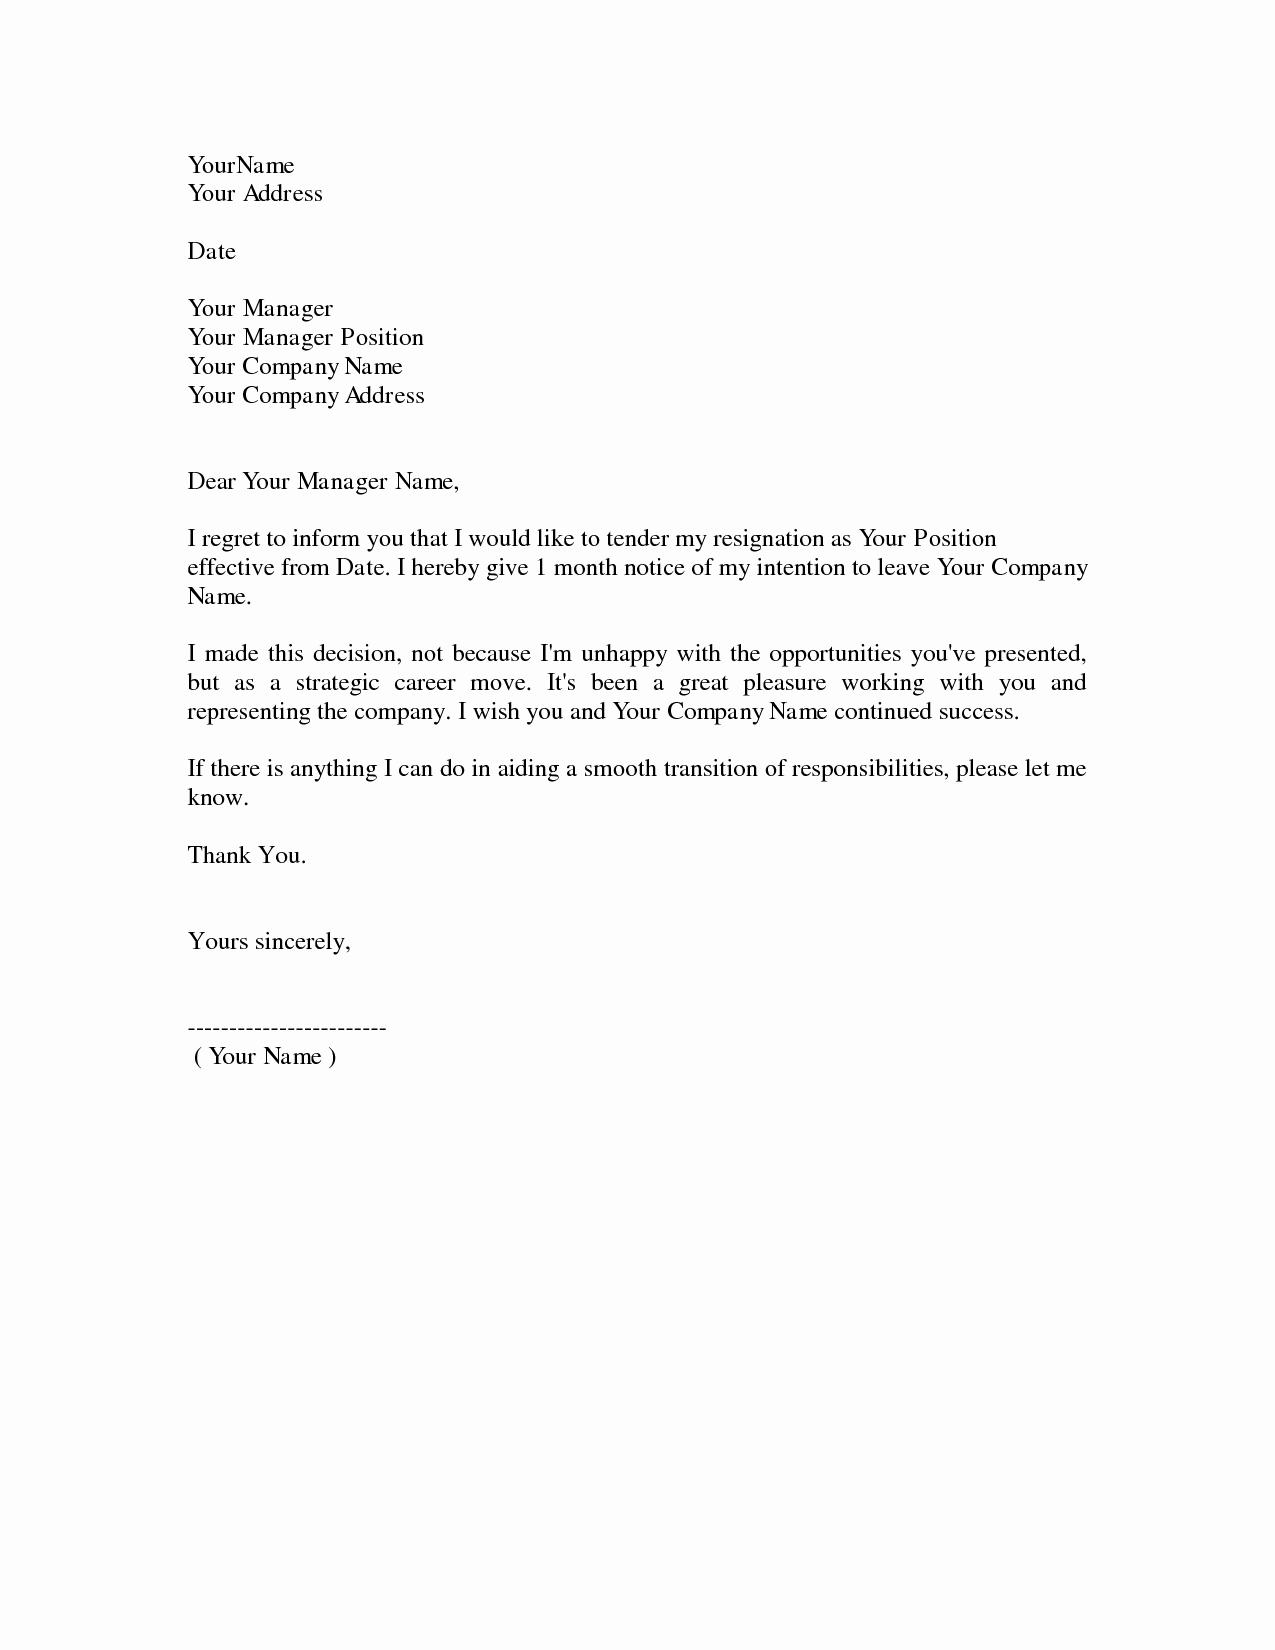 Resignation Letter Template Free Elegant Download Resignation Letters Pdf & Doc